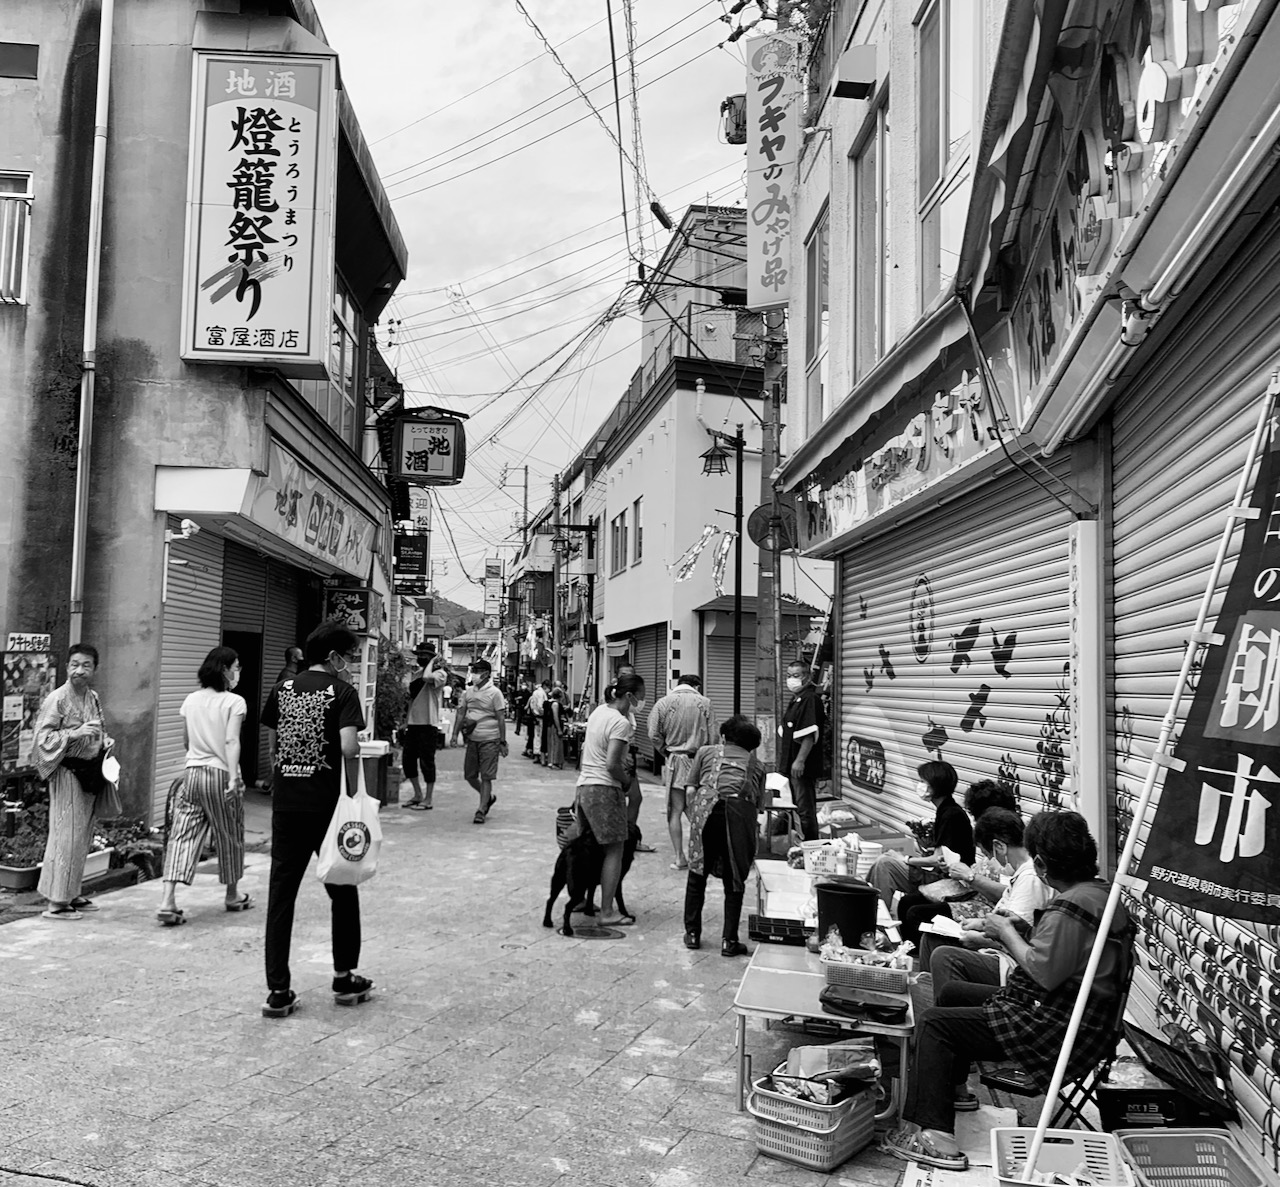 Farmers Market Nozawa Onsen